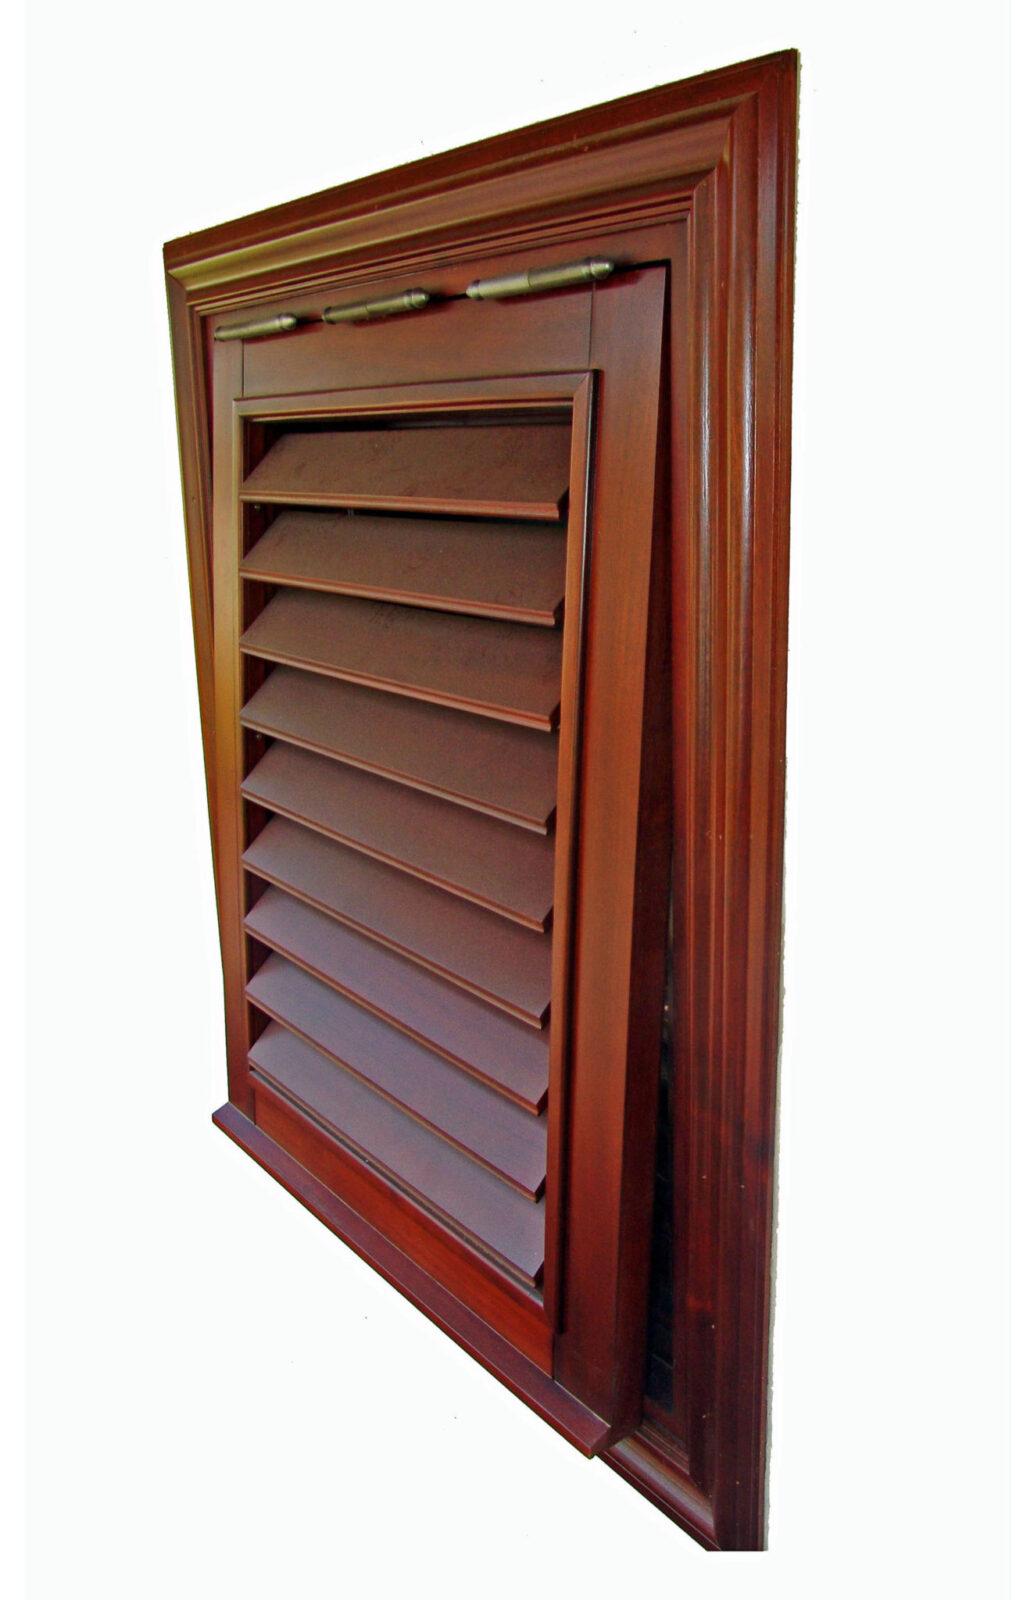 MARTINIQUE MAHOGANY SHUTTERS ON CASEMENT WINDOW